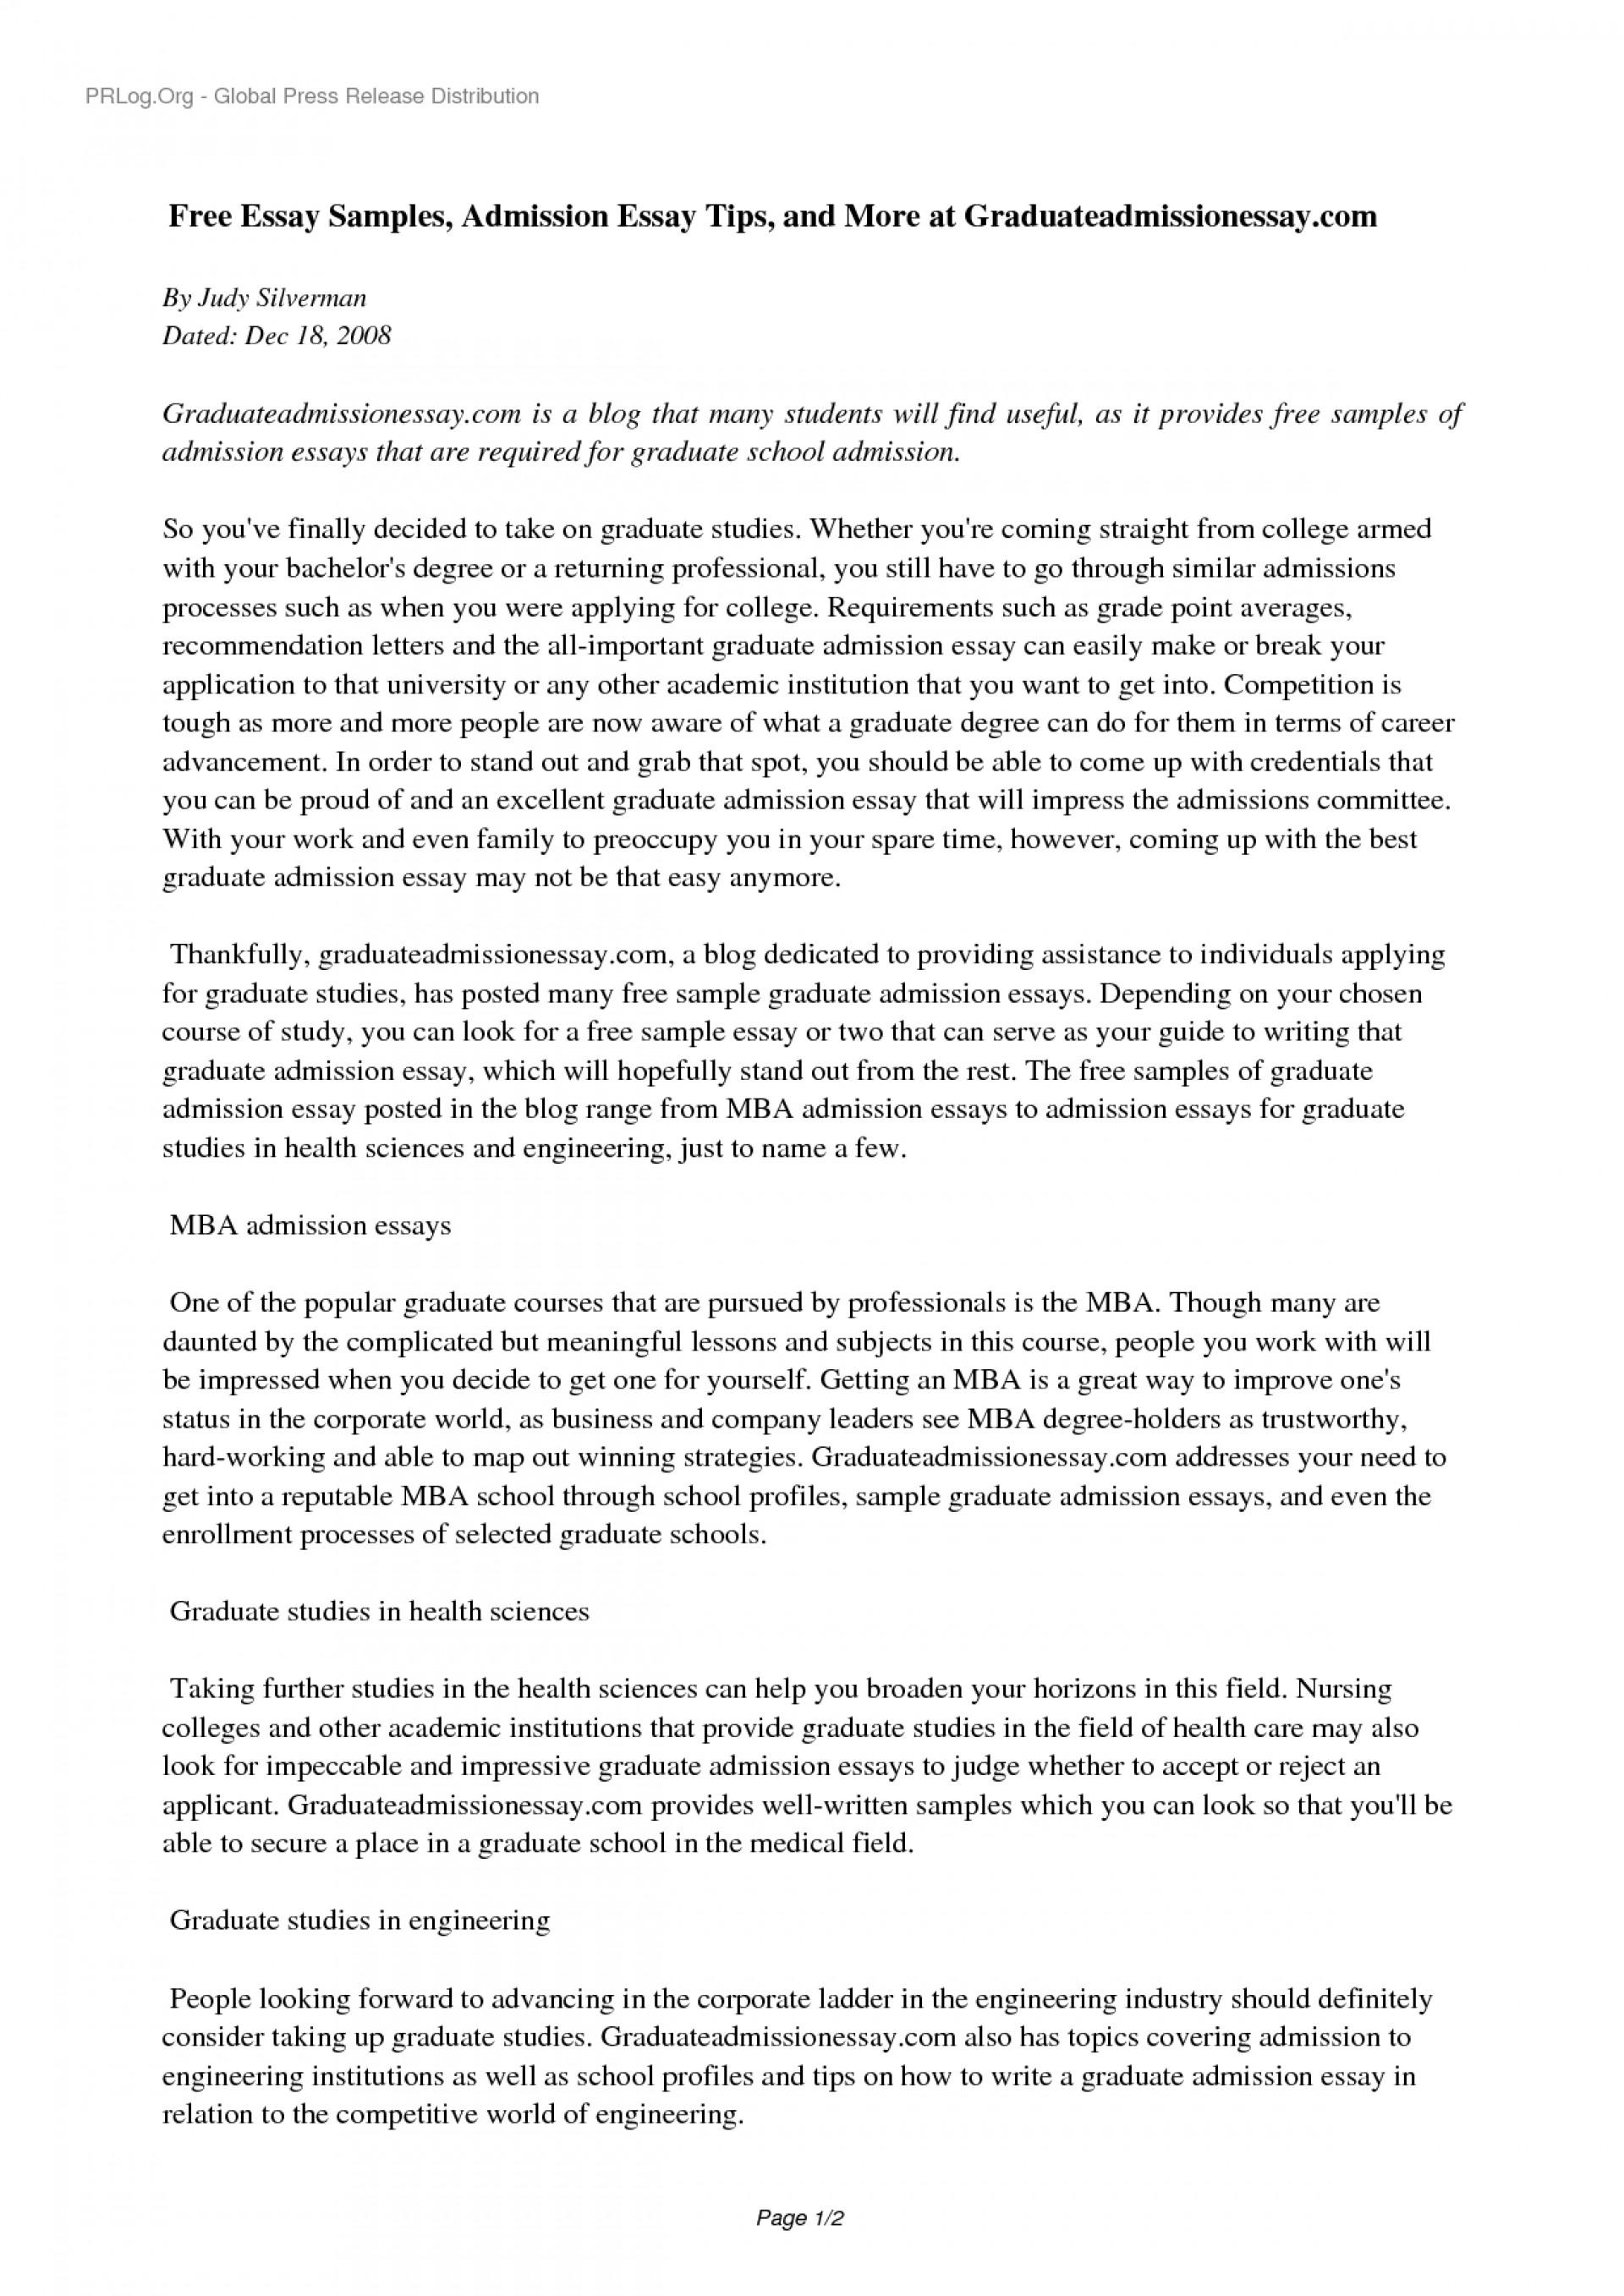 002 Essay Example Student Resume Internship Graduate School Template Motivational Letter Postgraduate Studies Solutions Grad Application Examples Cover Cute Applying Motivation Frightening Admission Social Work Nursing Samples 1920